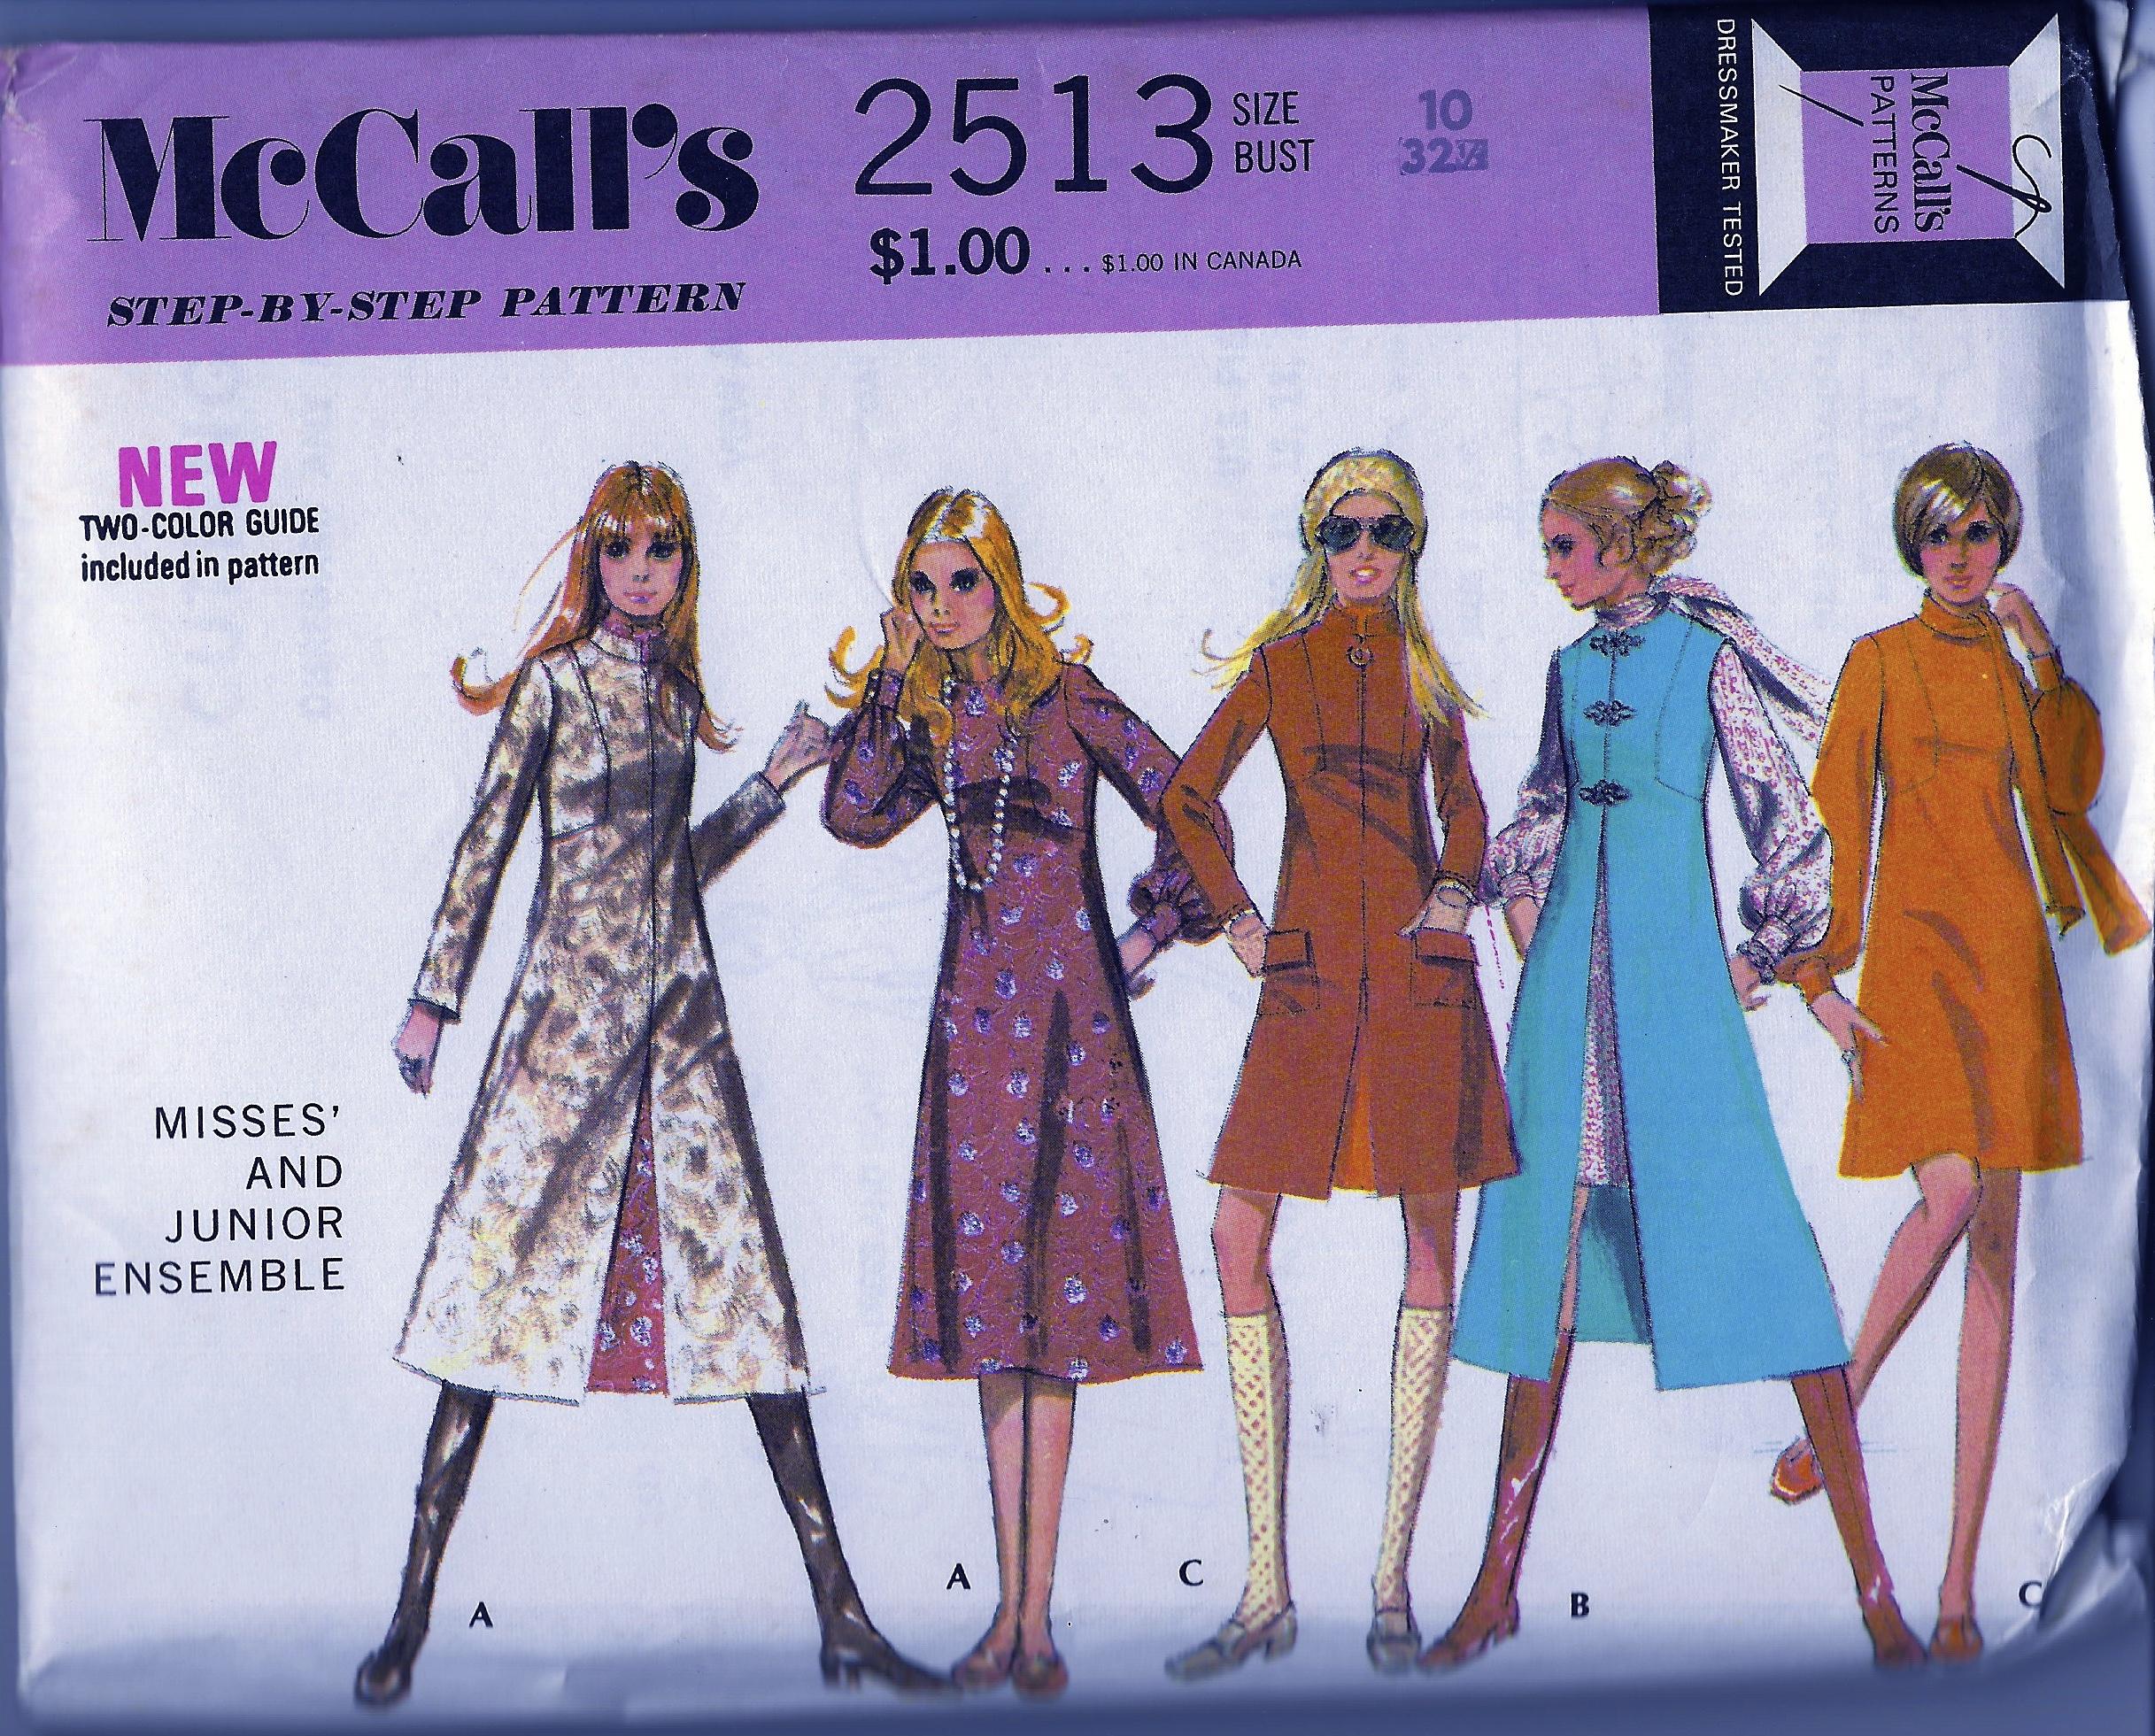 McCall's 2513 A